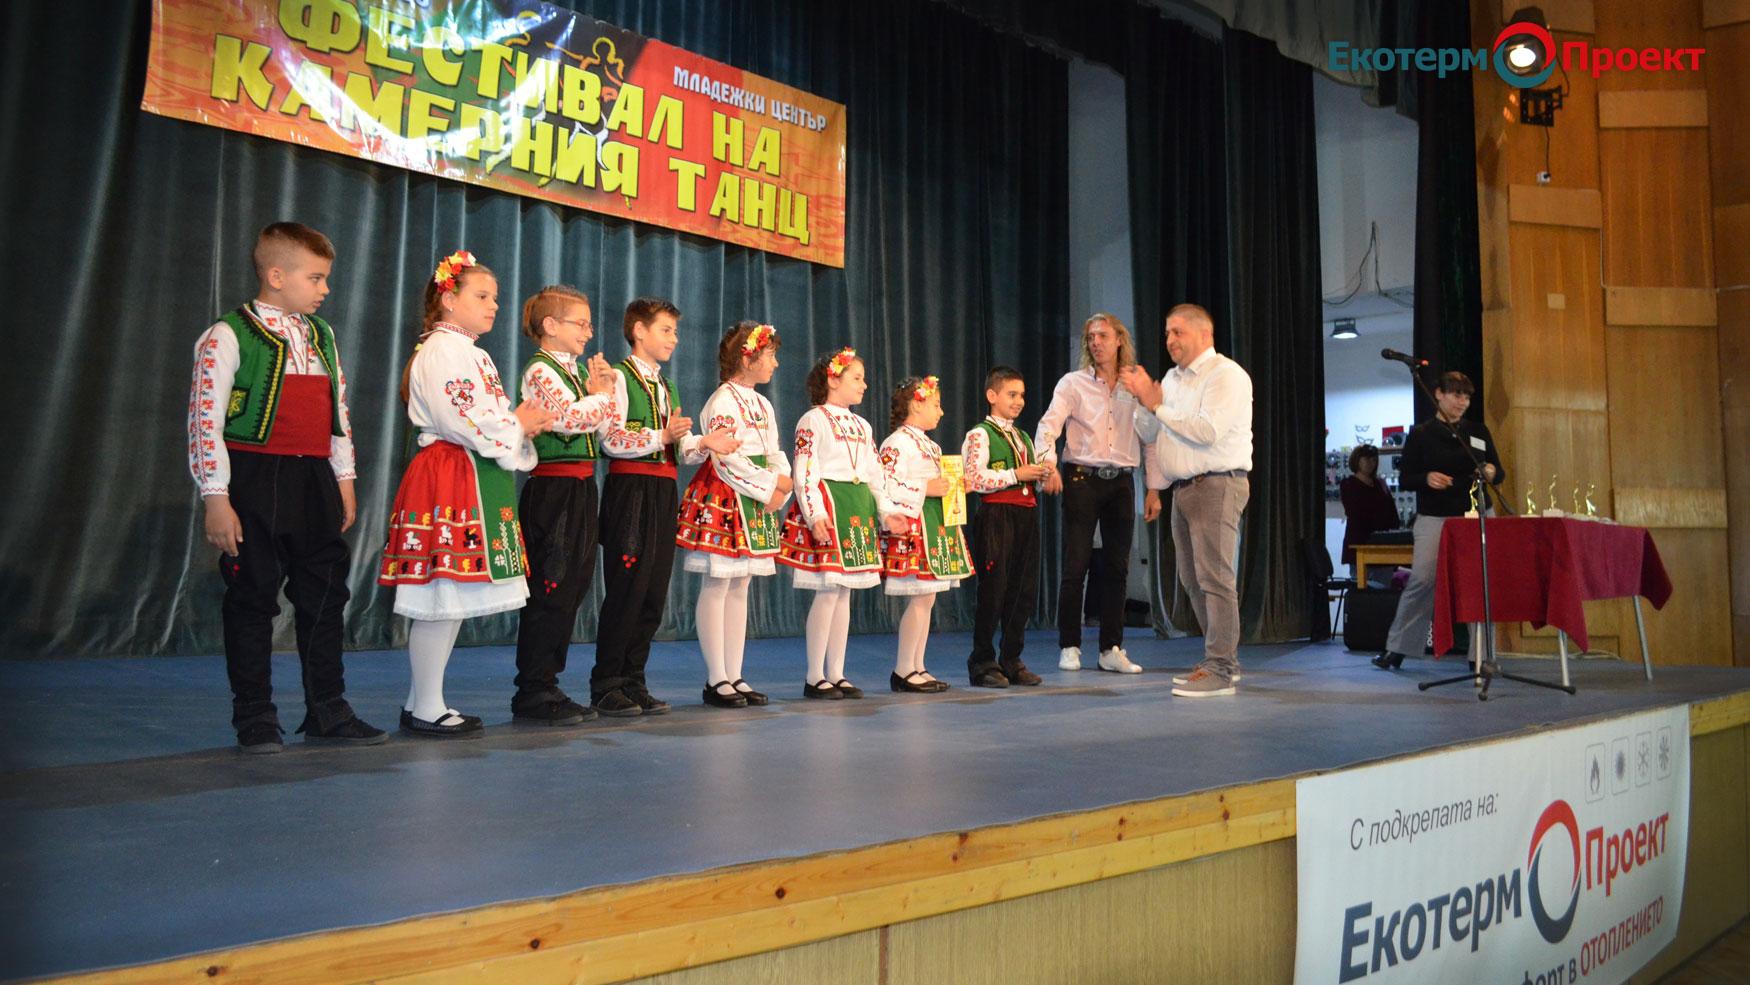 Ekoterm-Proekt-dance-donation-03_04-2019-d